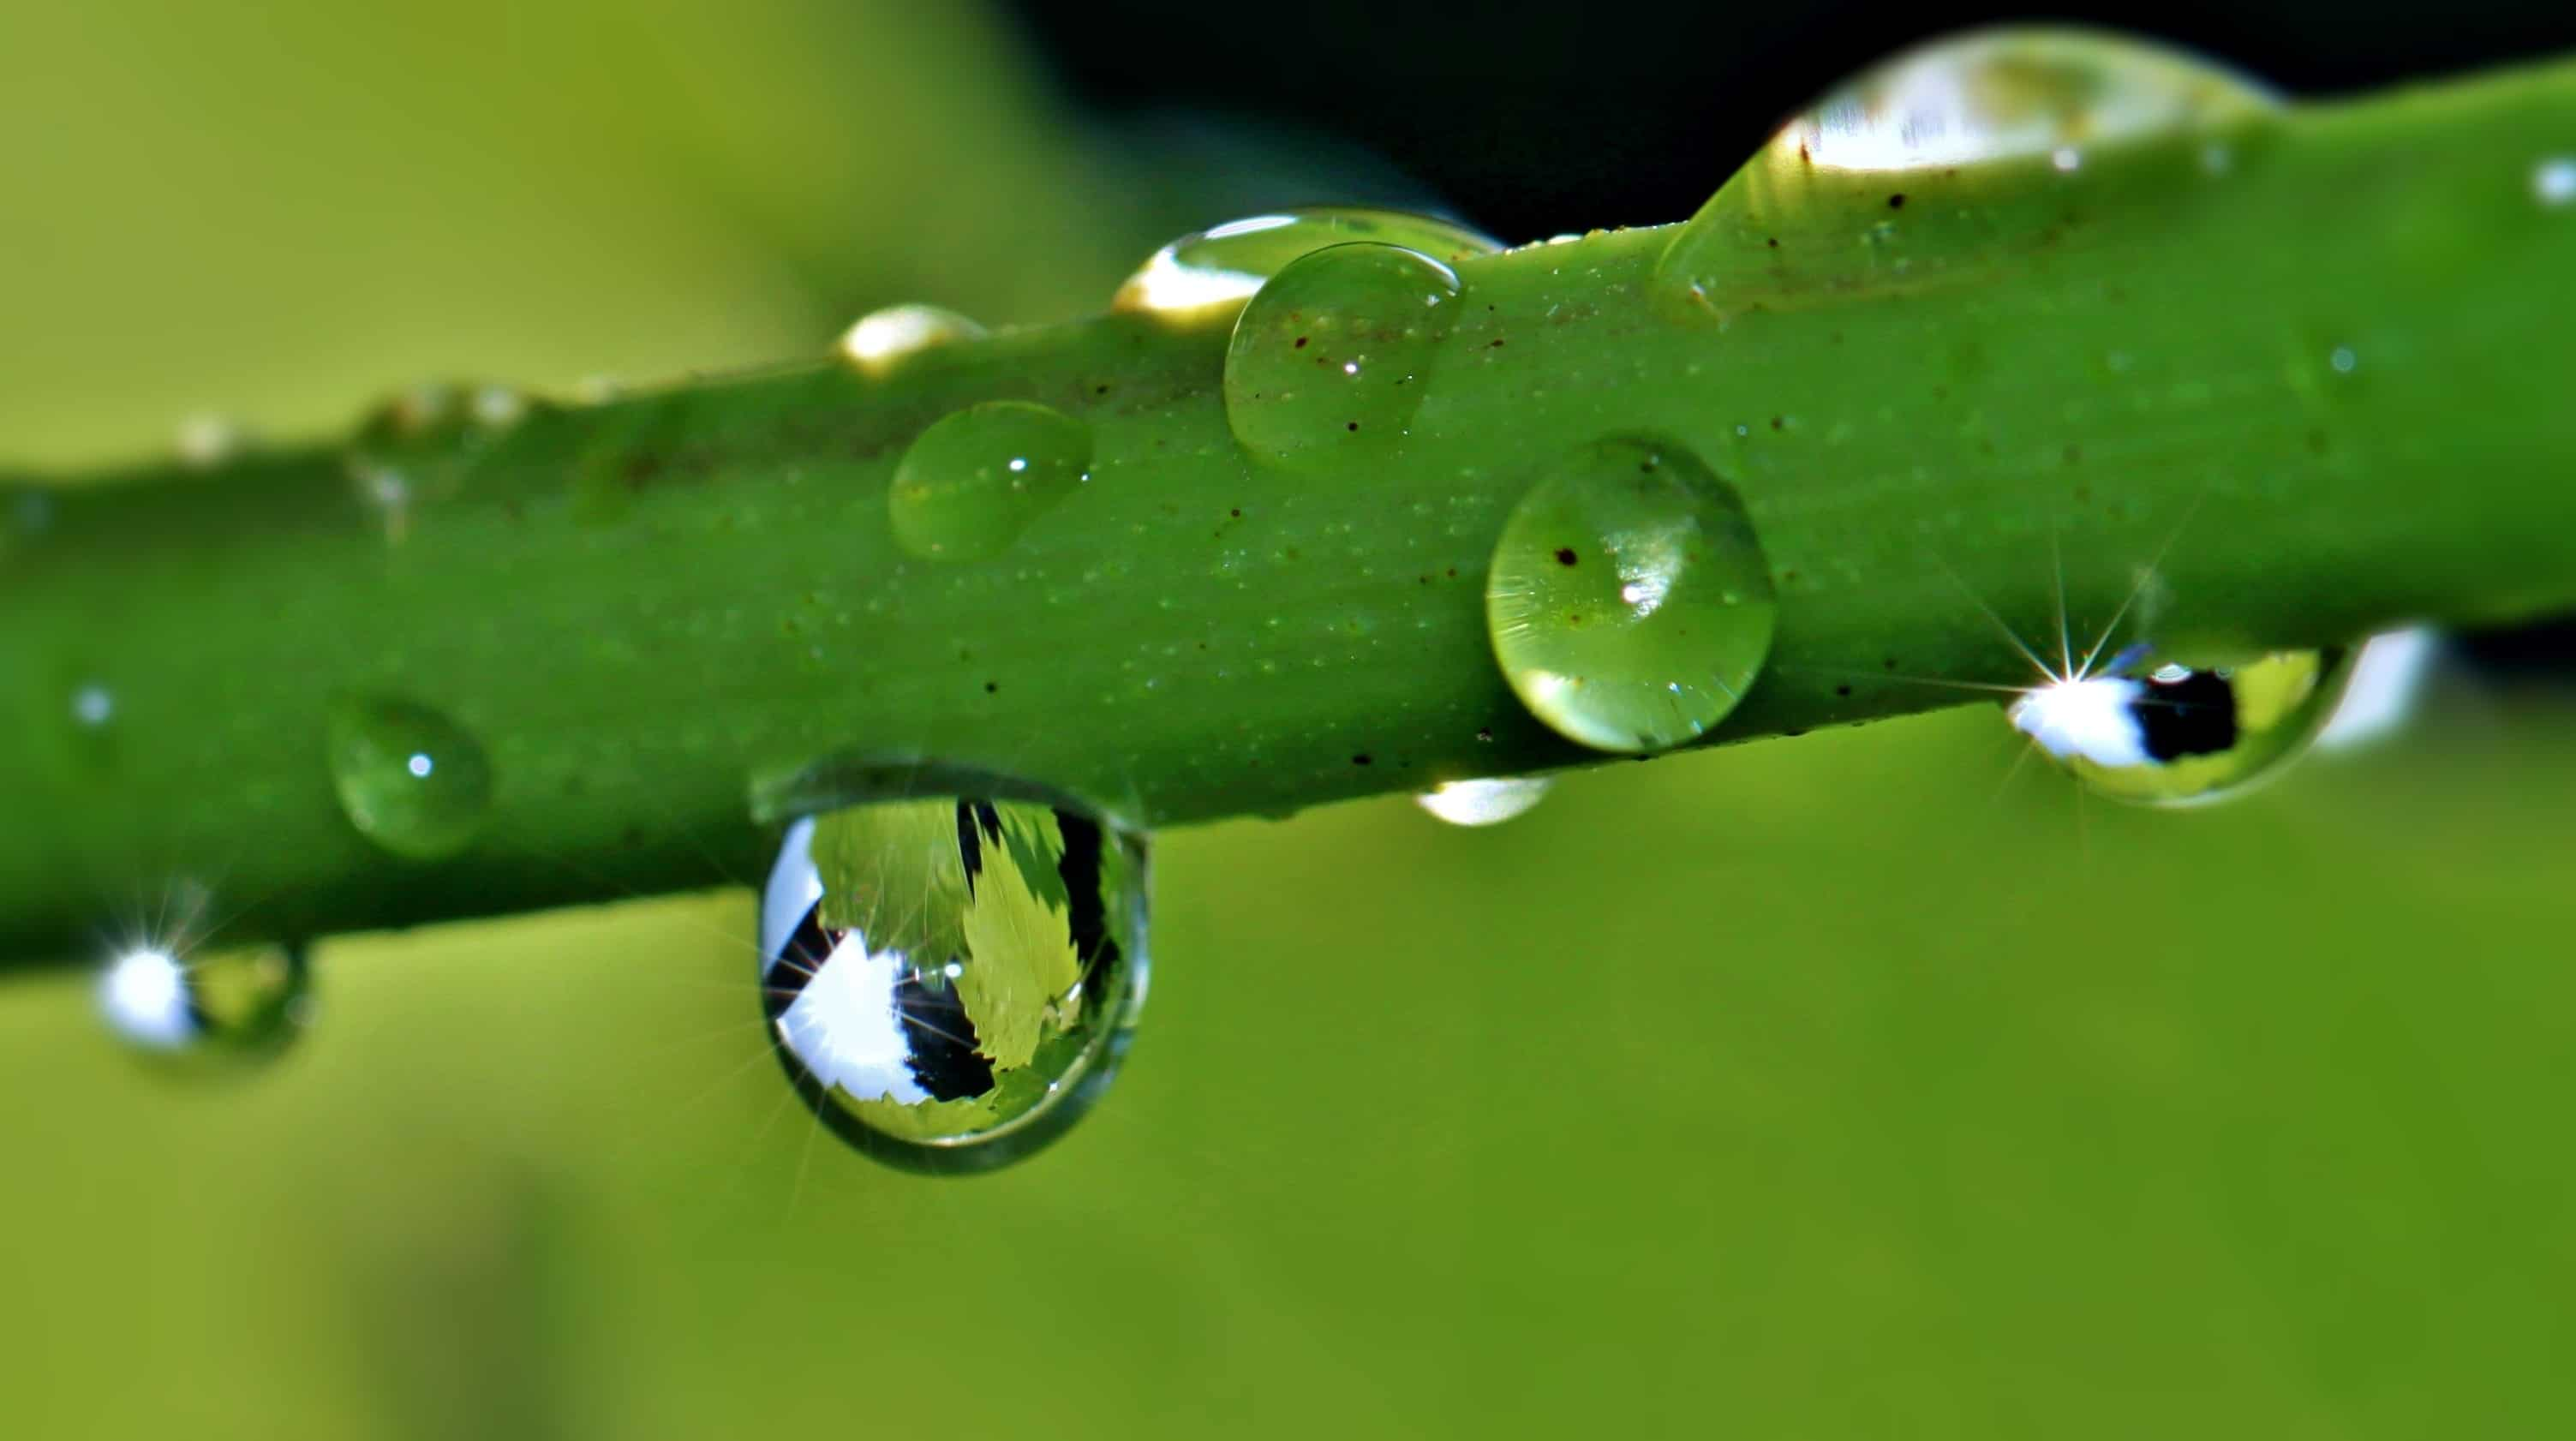 3d Wallpaper Water Drop Free Picture Flora Leaf Nature Rain Droplet Dew